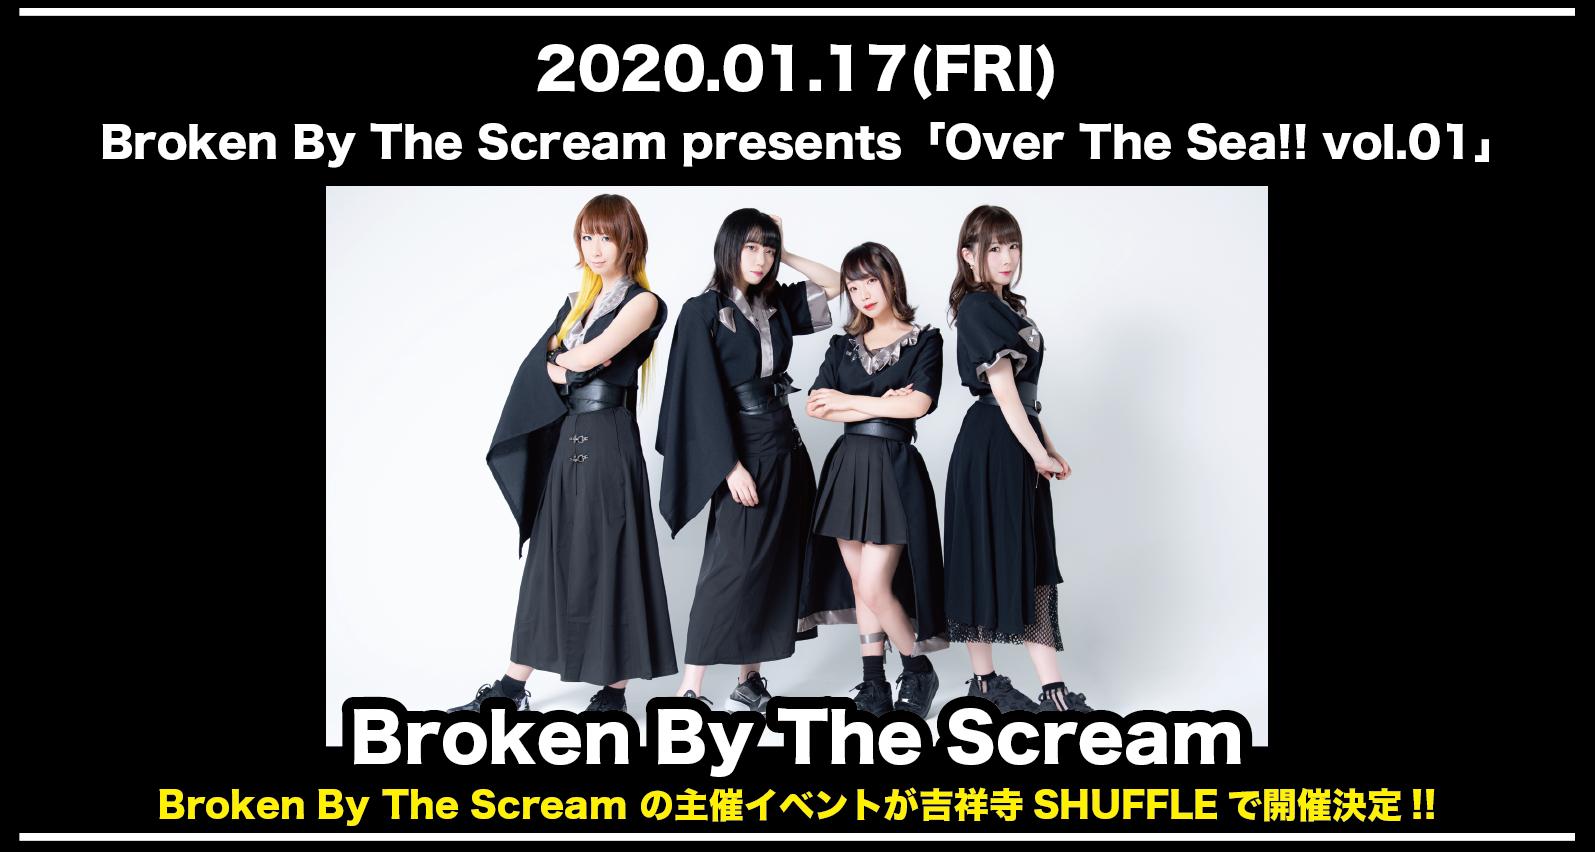 Broken By The Scream presents「Over The Sea!! vol.01」